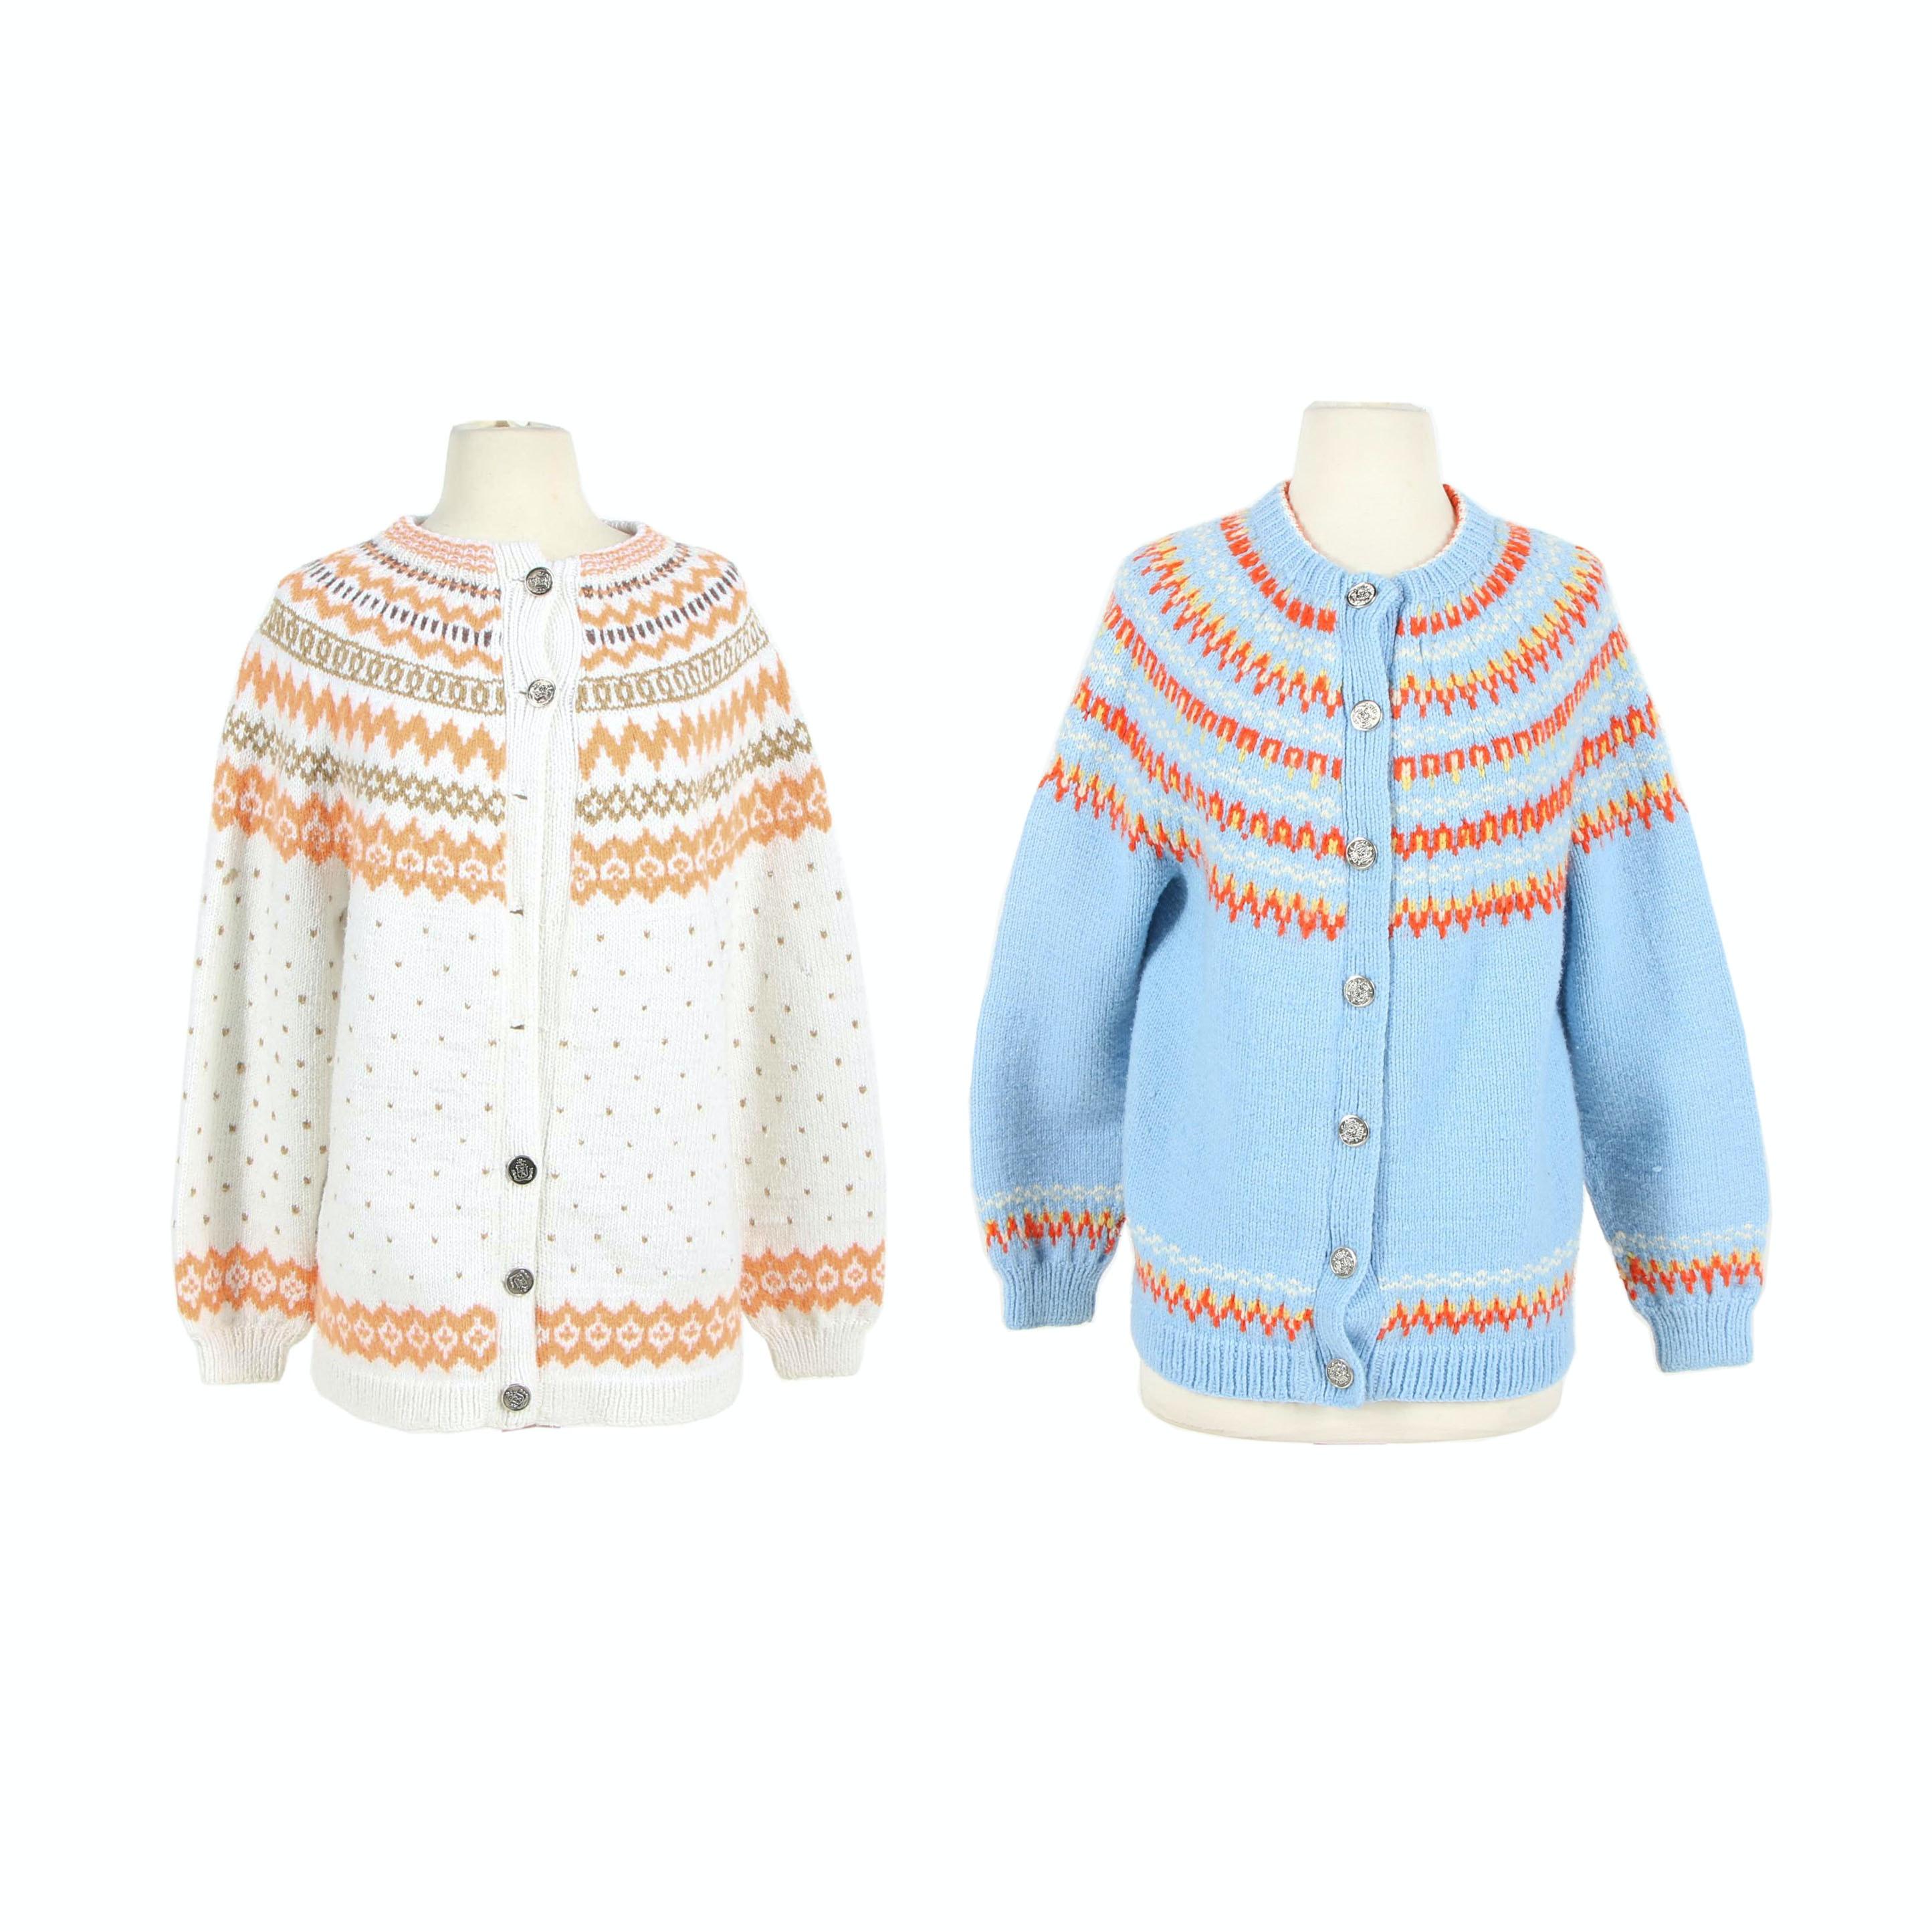 Women's Aase Haldborg Hand-Knitted Cardigan Sweaters, Vintage